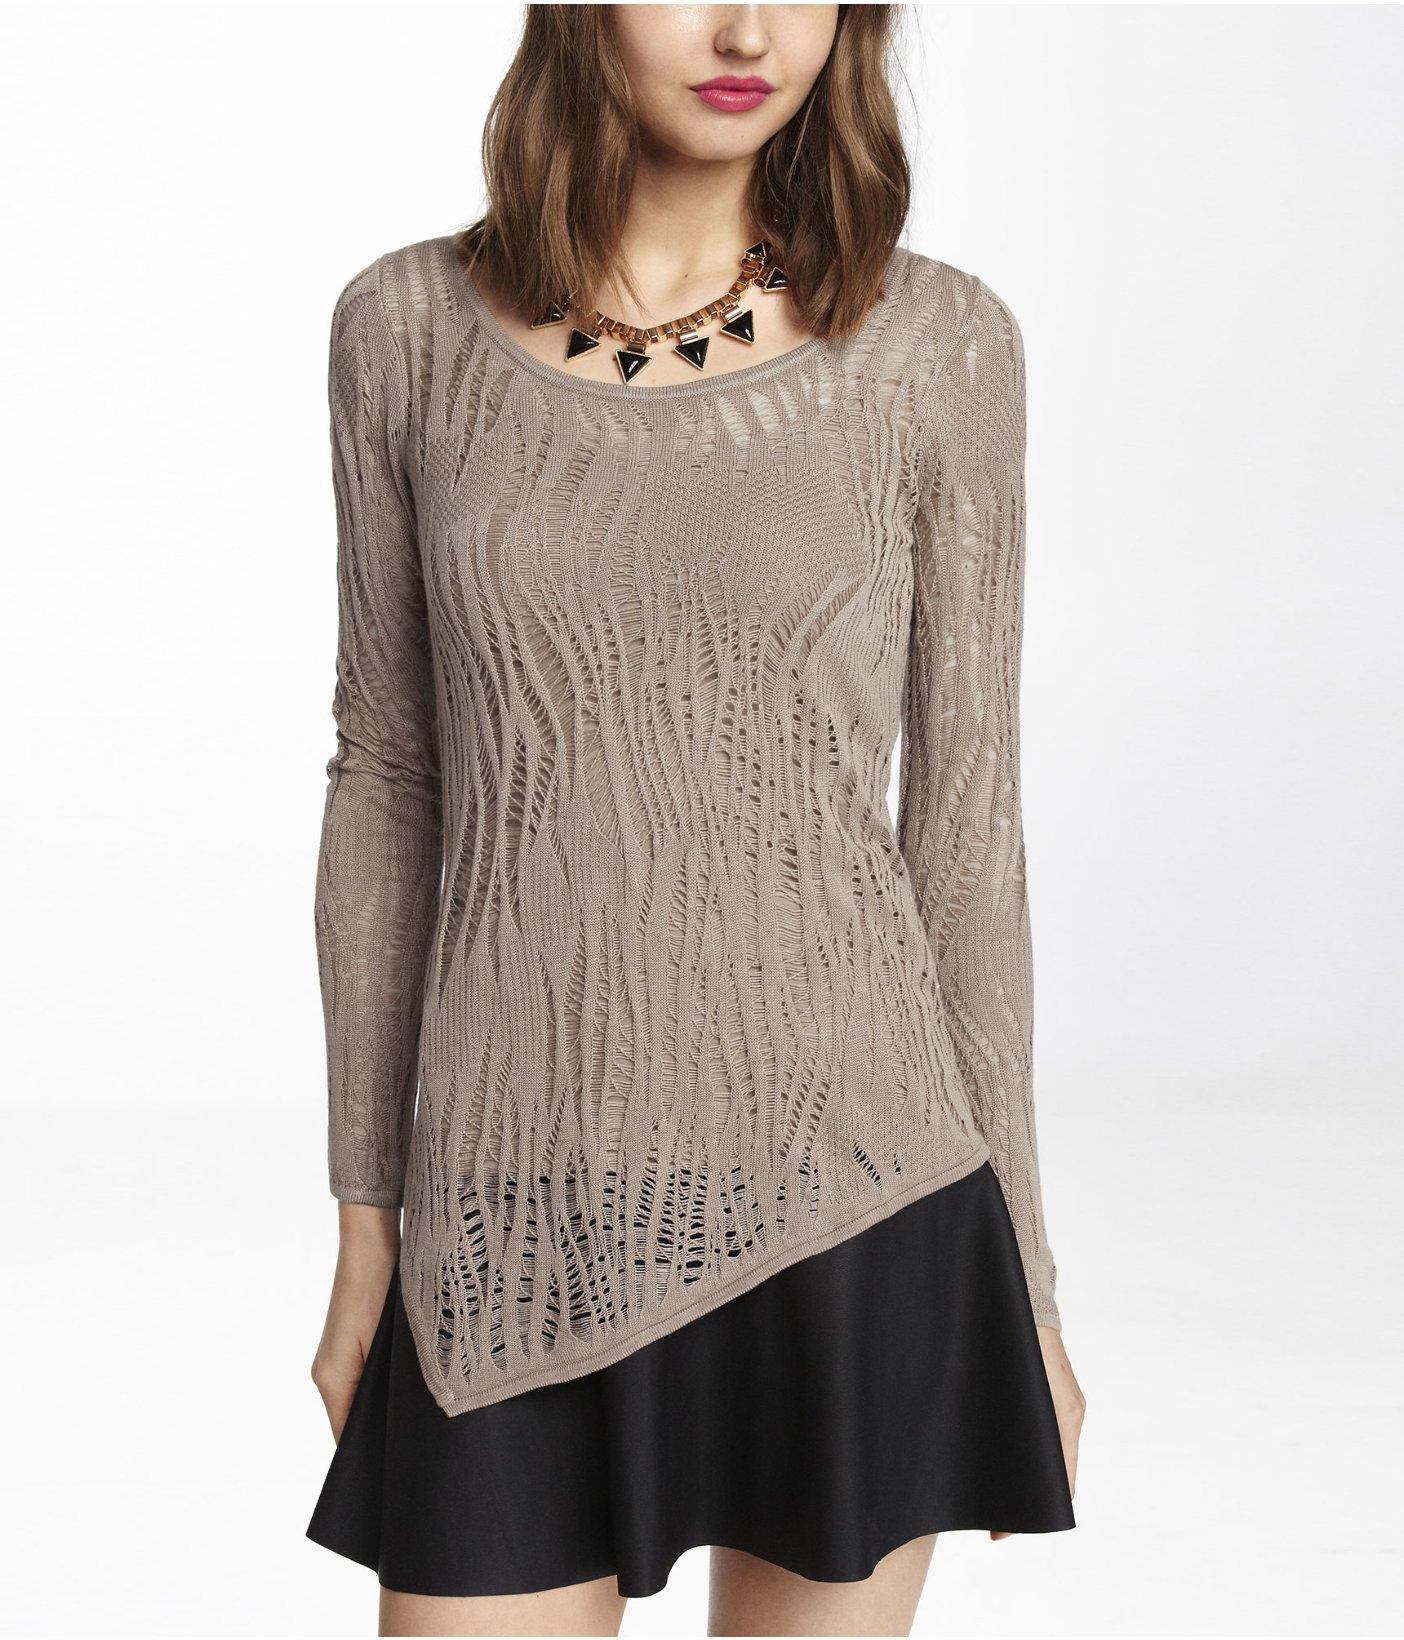 Express Lace Stitch Asymmetrical Hem Tunic Sweater in Gray | Lyst